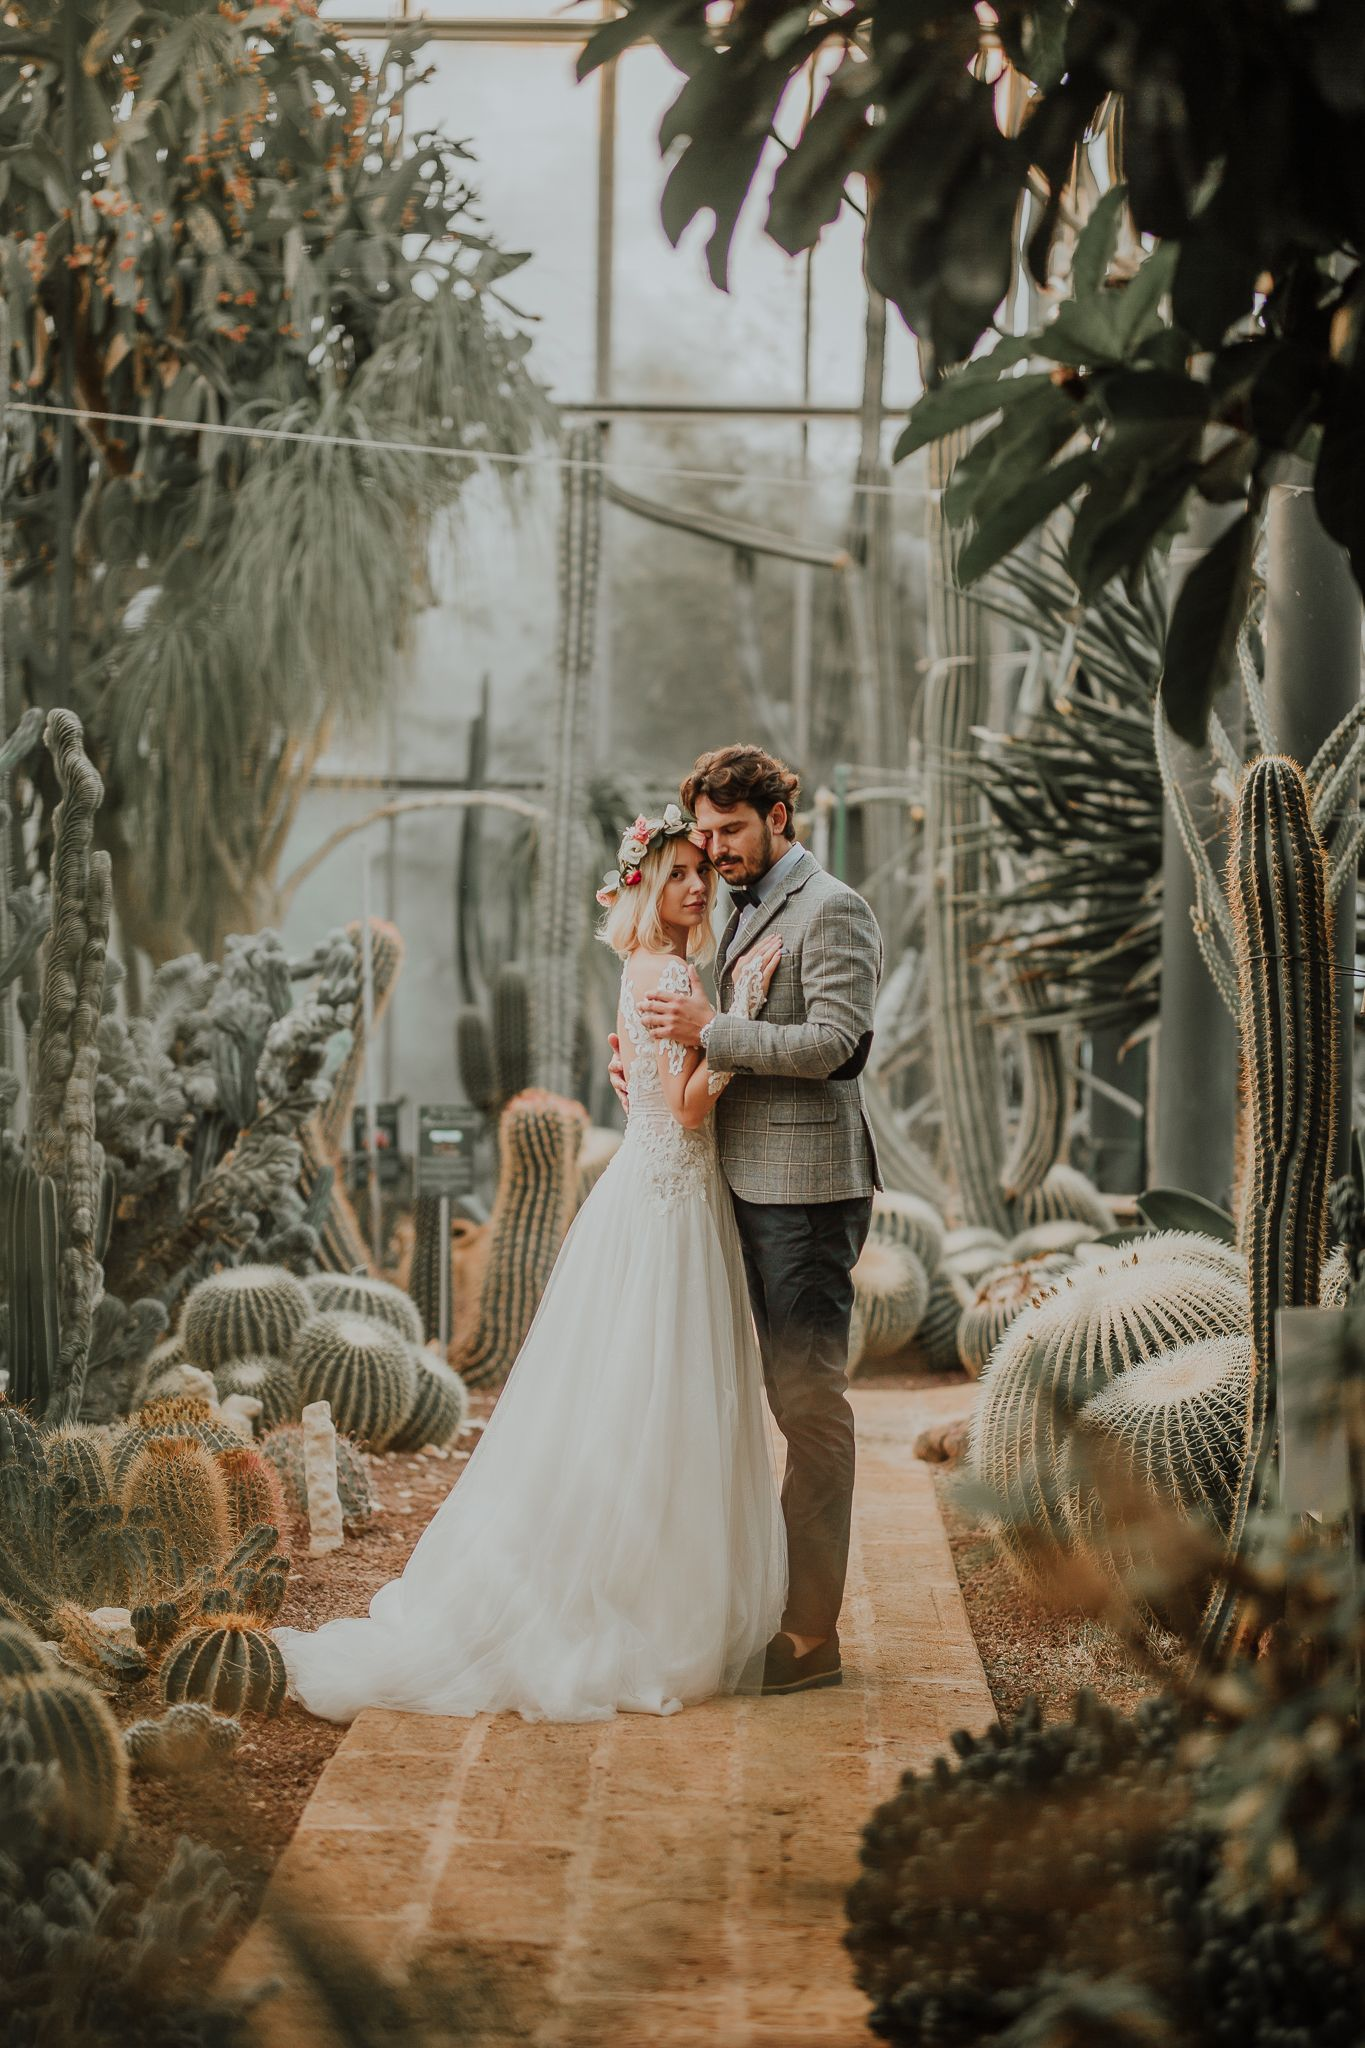 Wedding vase decorations november 2018 Daily Update  November th  Jessica clark and Weddings